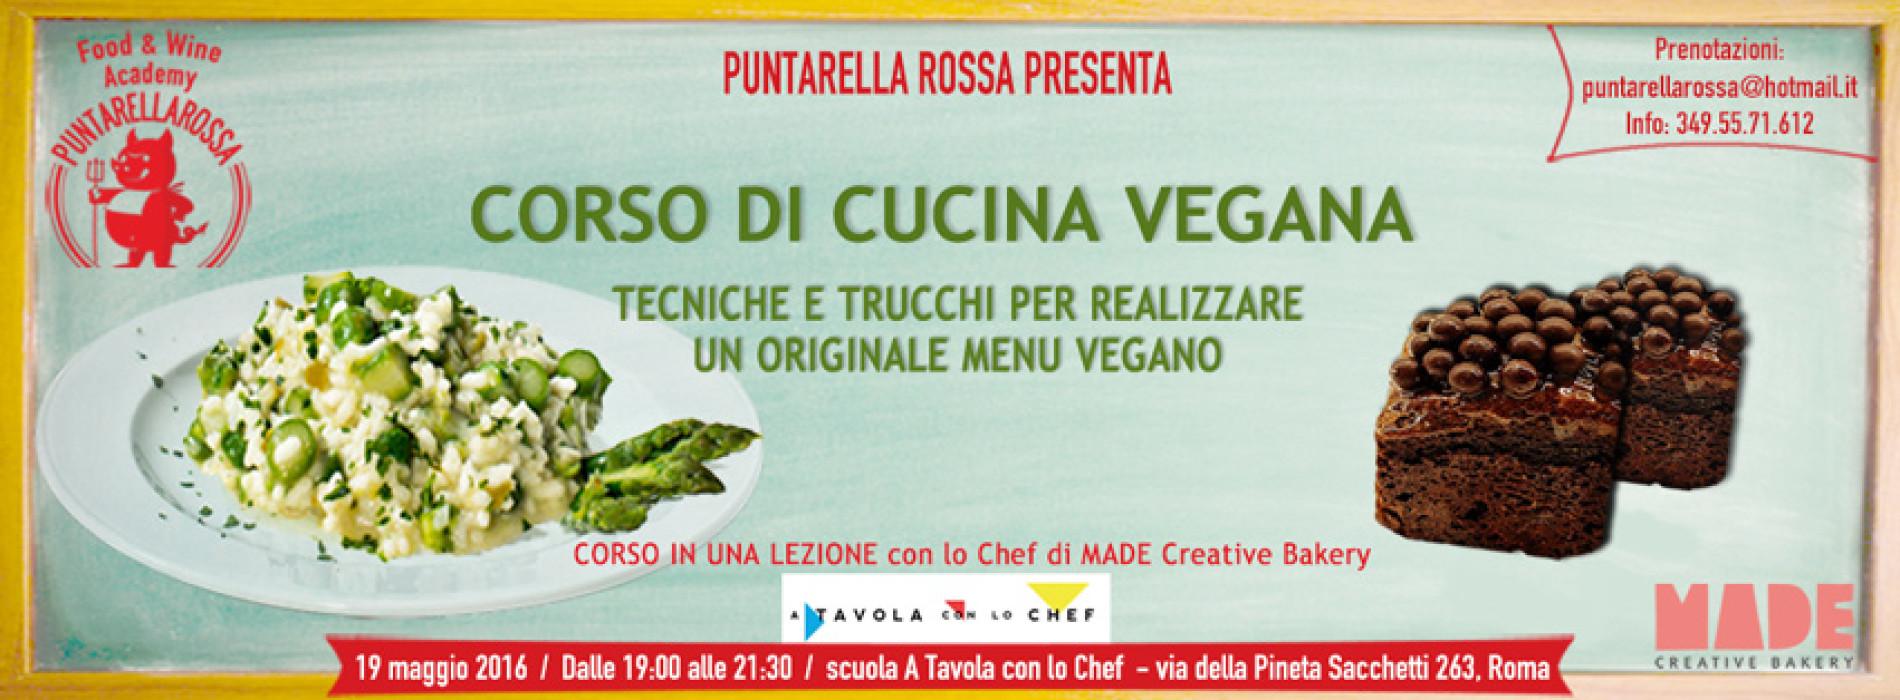 corso di cucina vegana a roma, 19 maggio 2016 - puntarella rossa - Cucina Vegana Roma